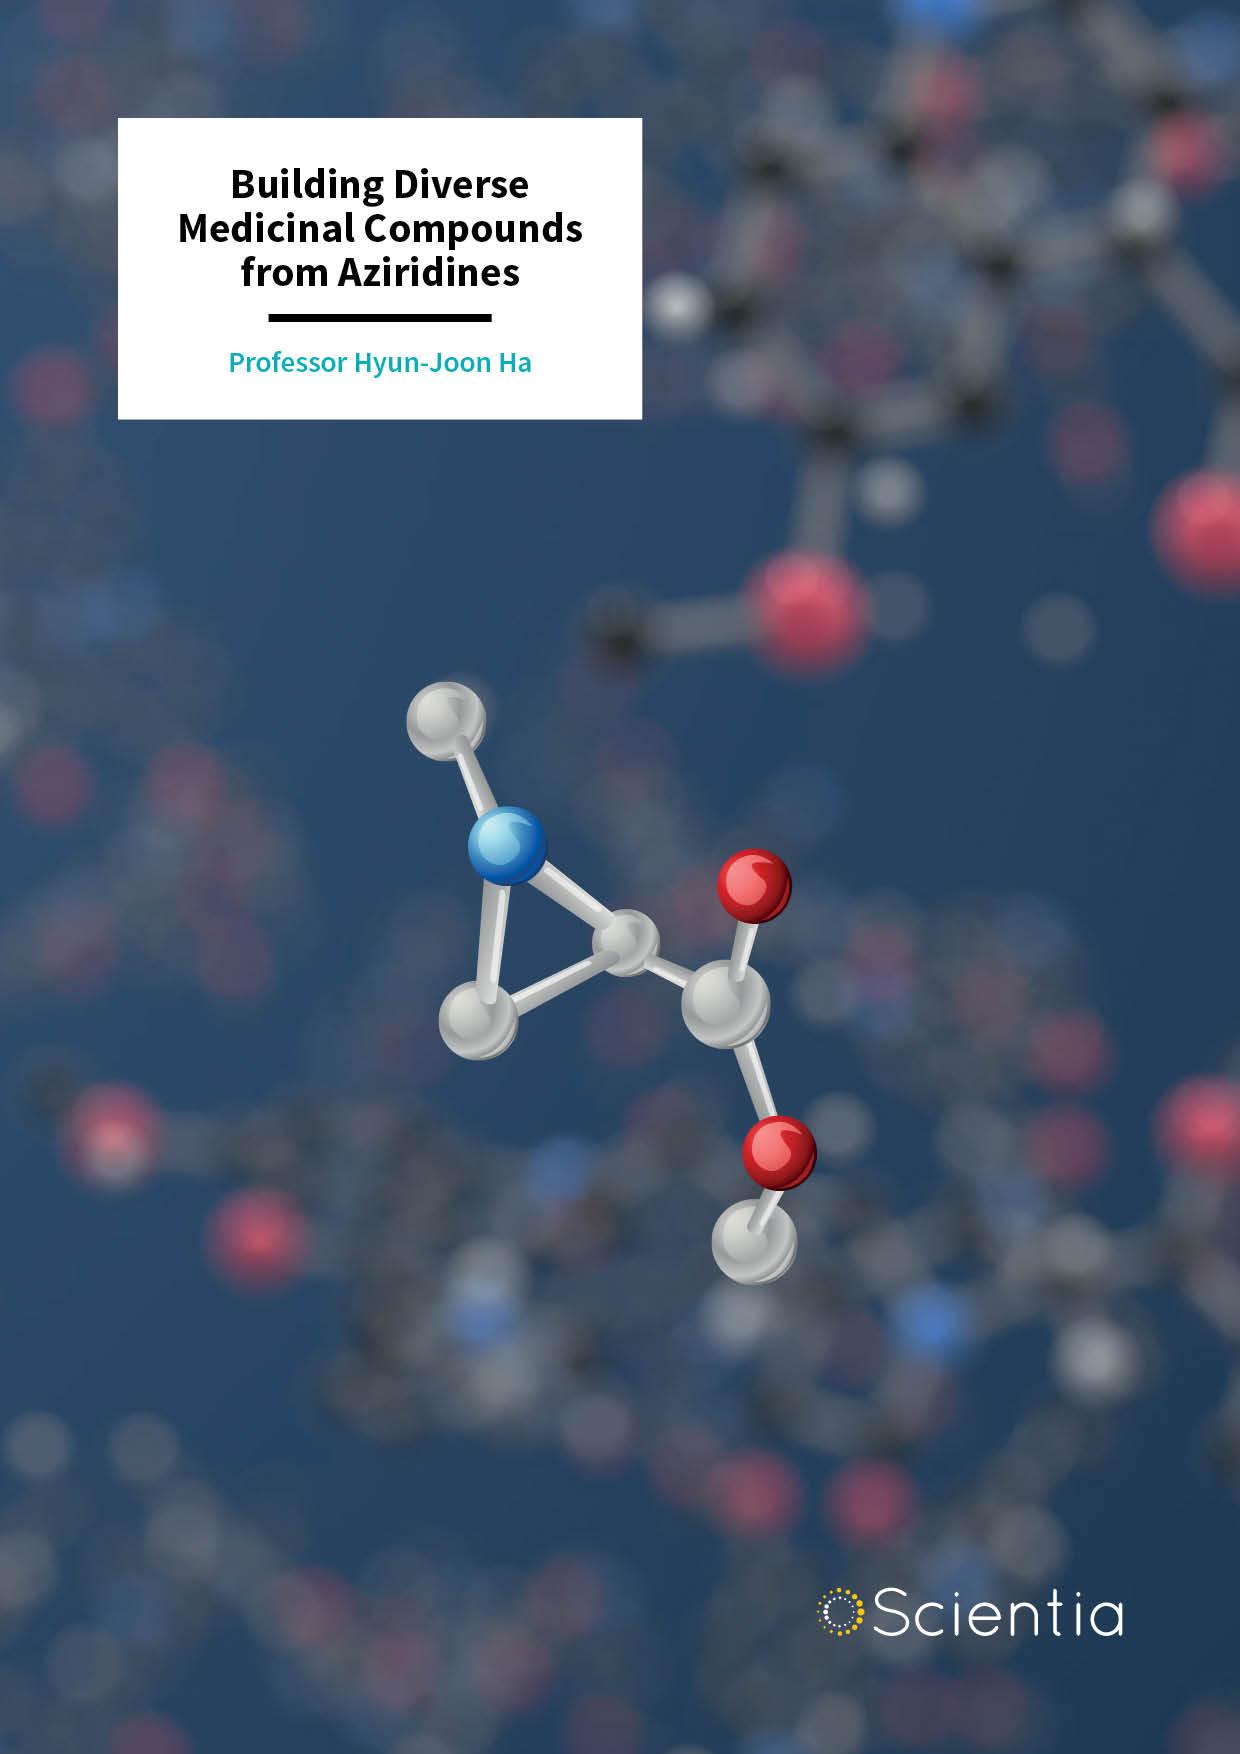 Professor Hyun-Joon Ha – Building Diverse Medicinal Compounds from Aziridines